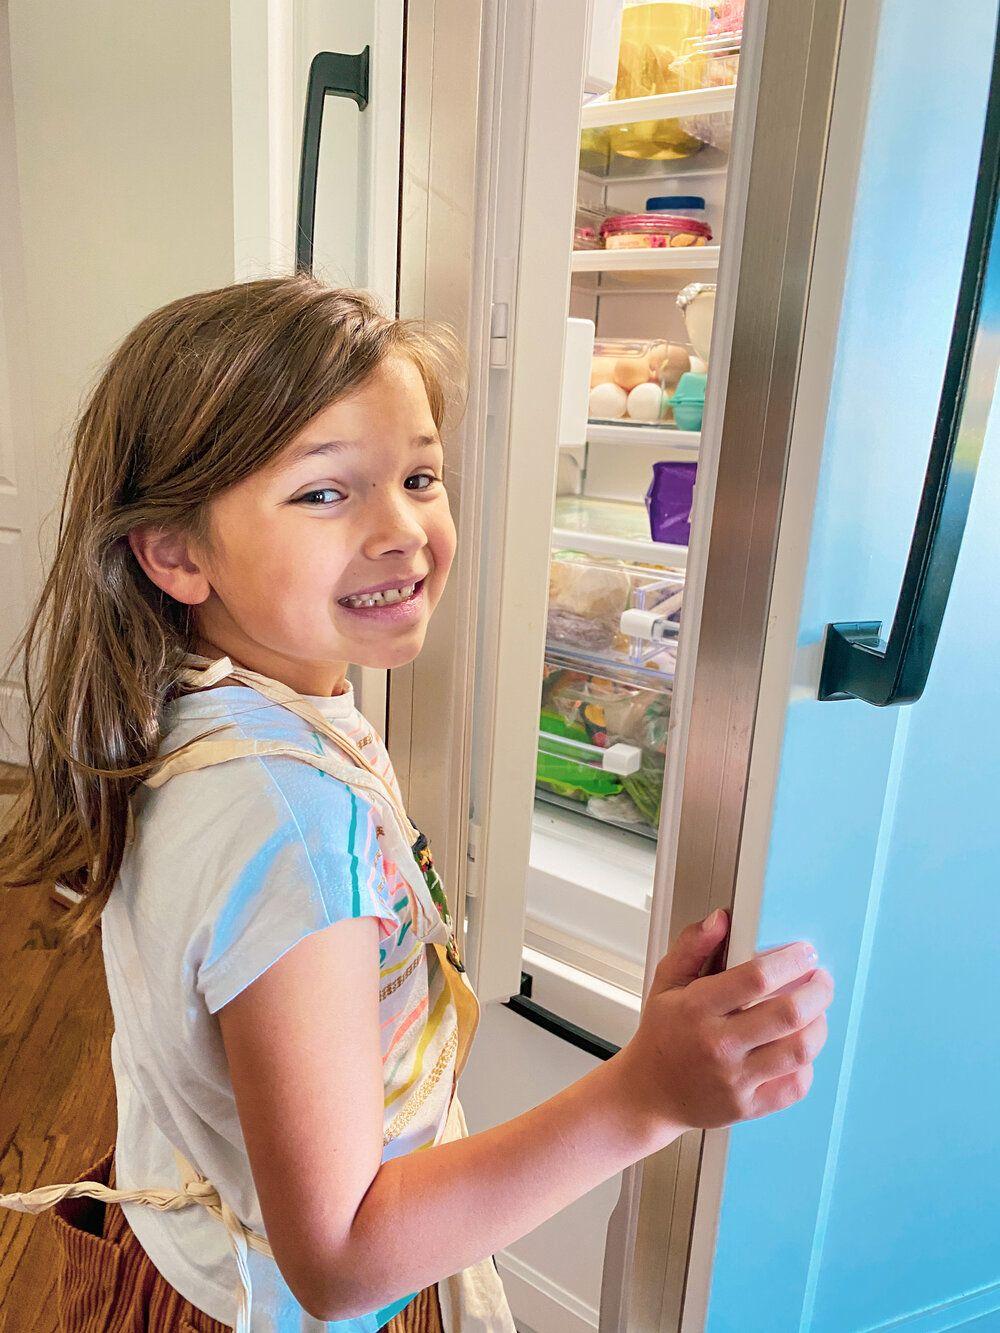 evee in fridge.JPG